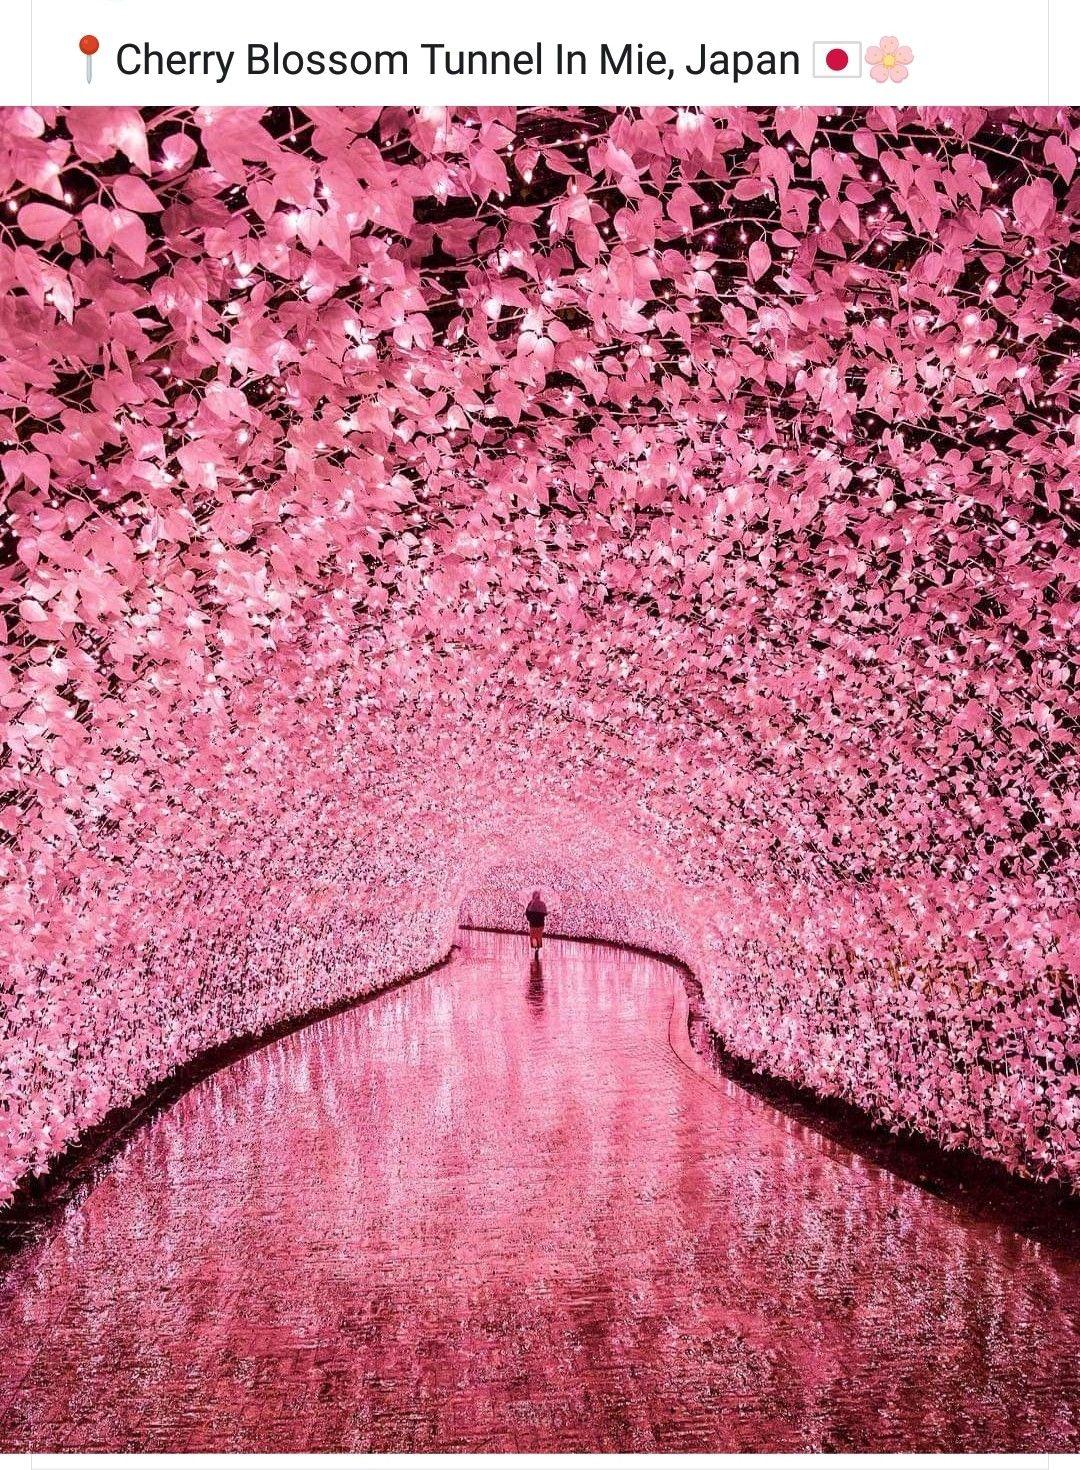 Cherry Blossom Tunnel Nabana No Sato Mie Japan Cherry Blossom Japan Cherry Blossom Nabana No Sato